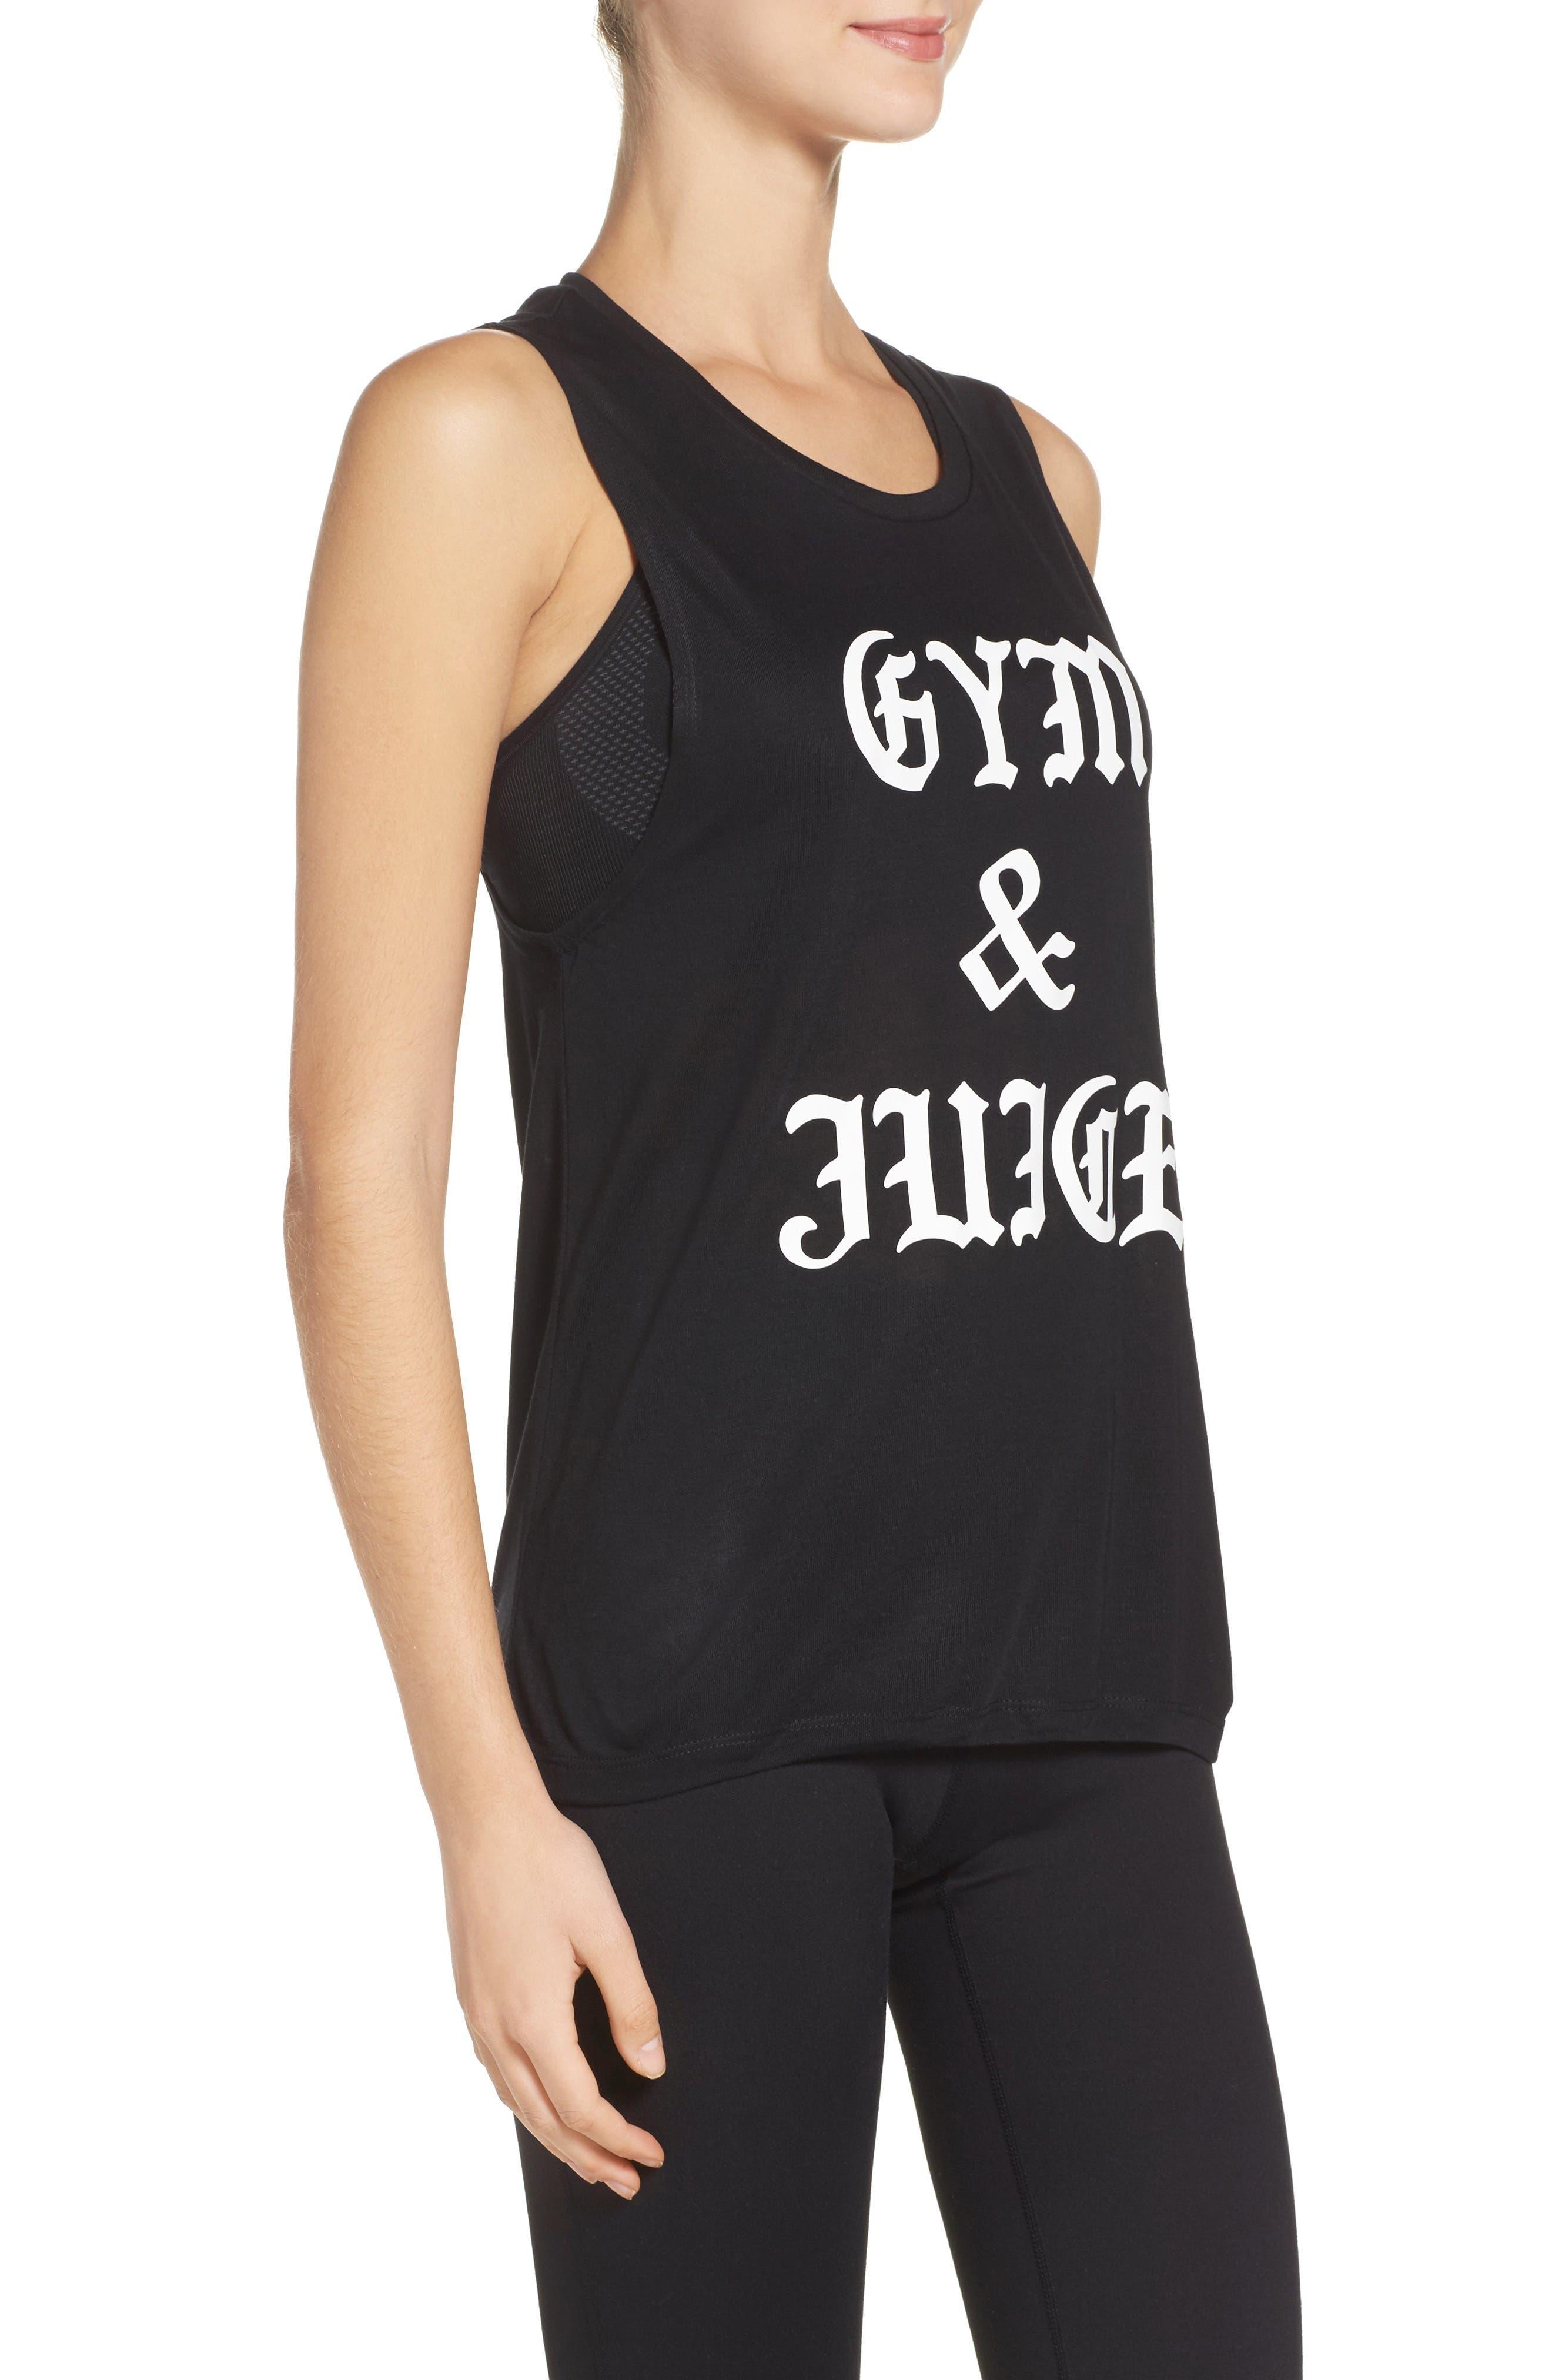 Gym & Juice Tank,                             Alternate thumbnail 3, color,                             001